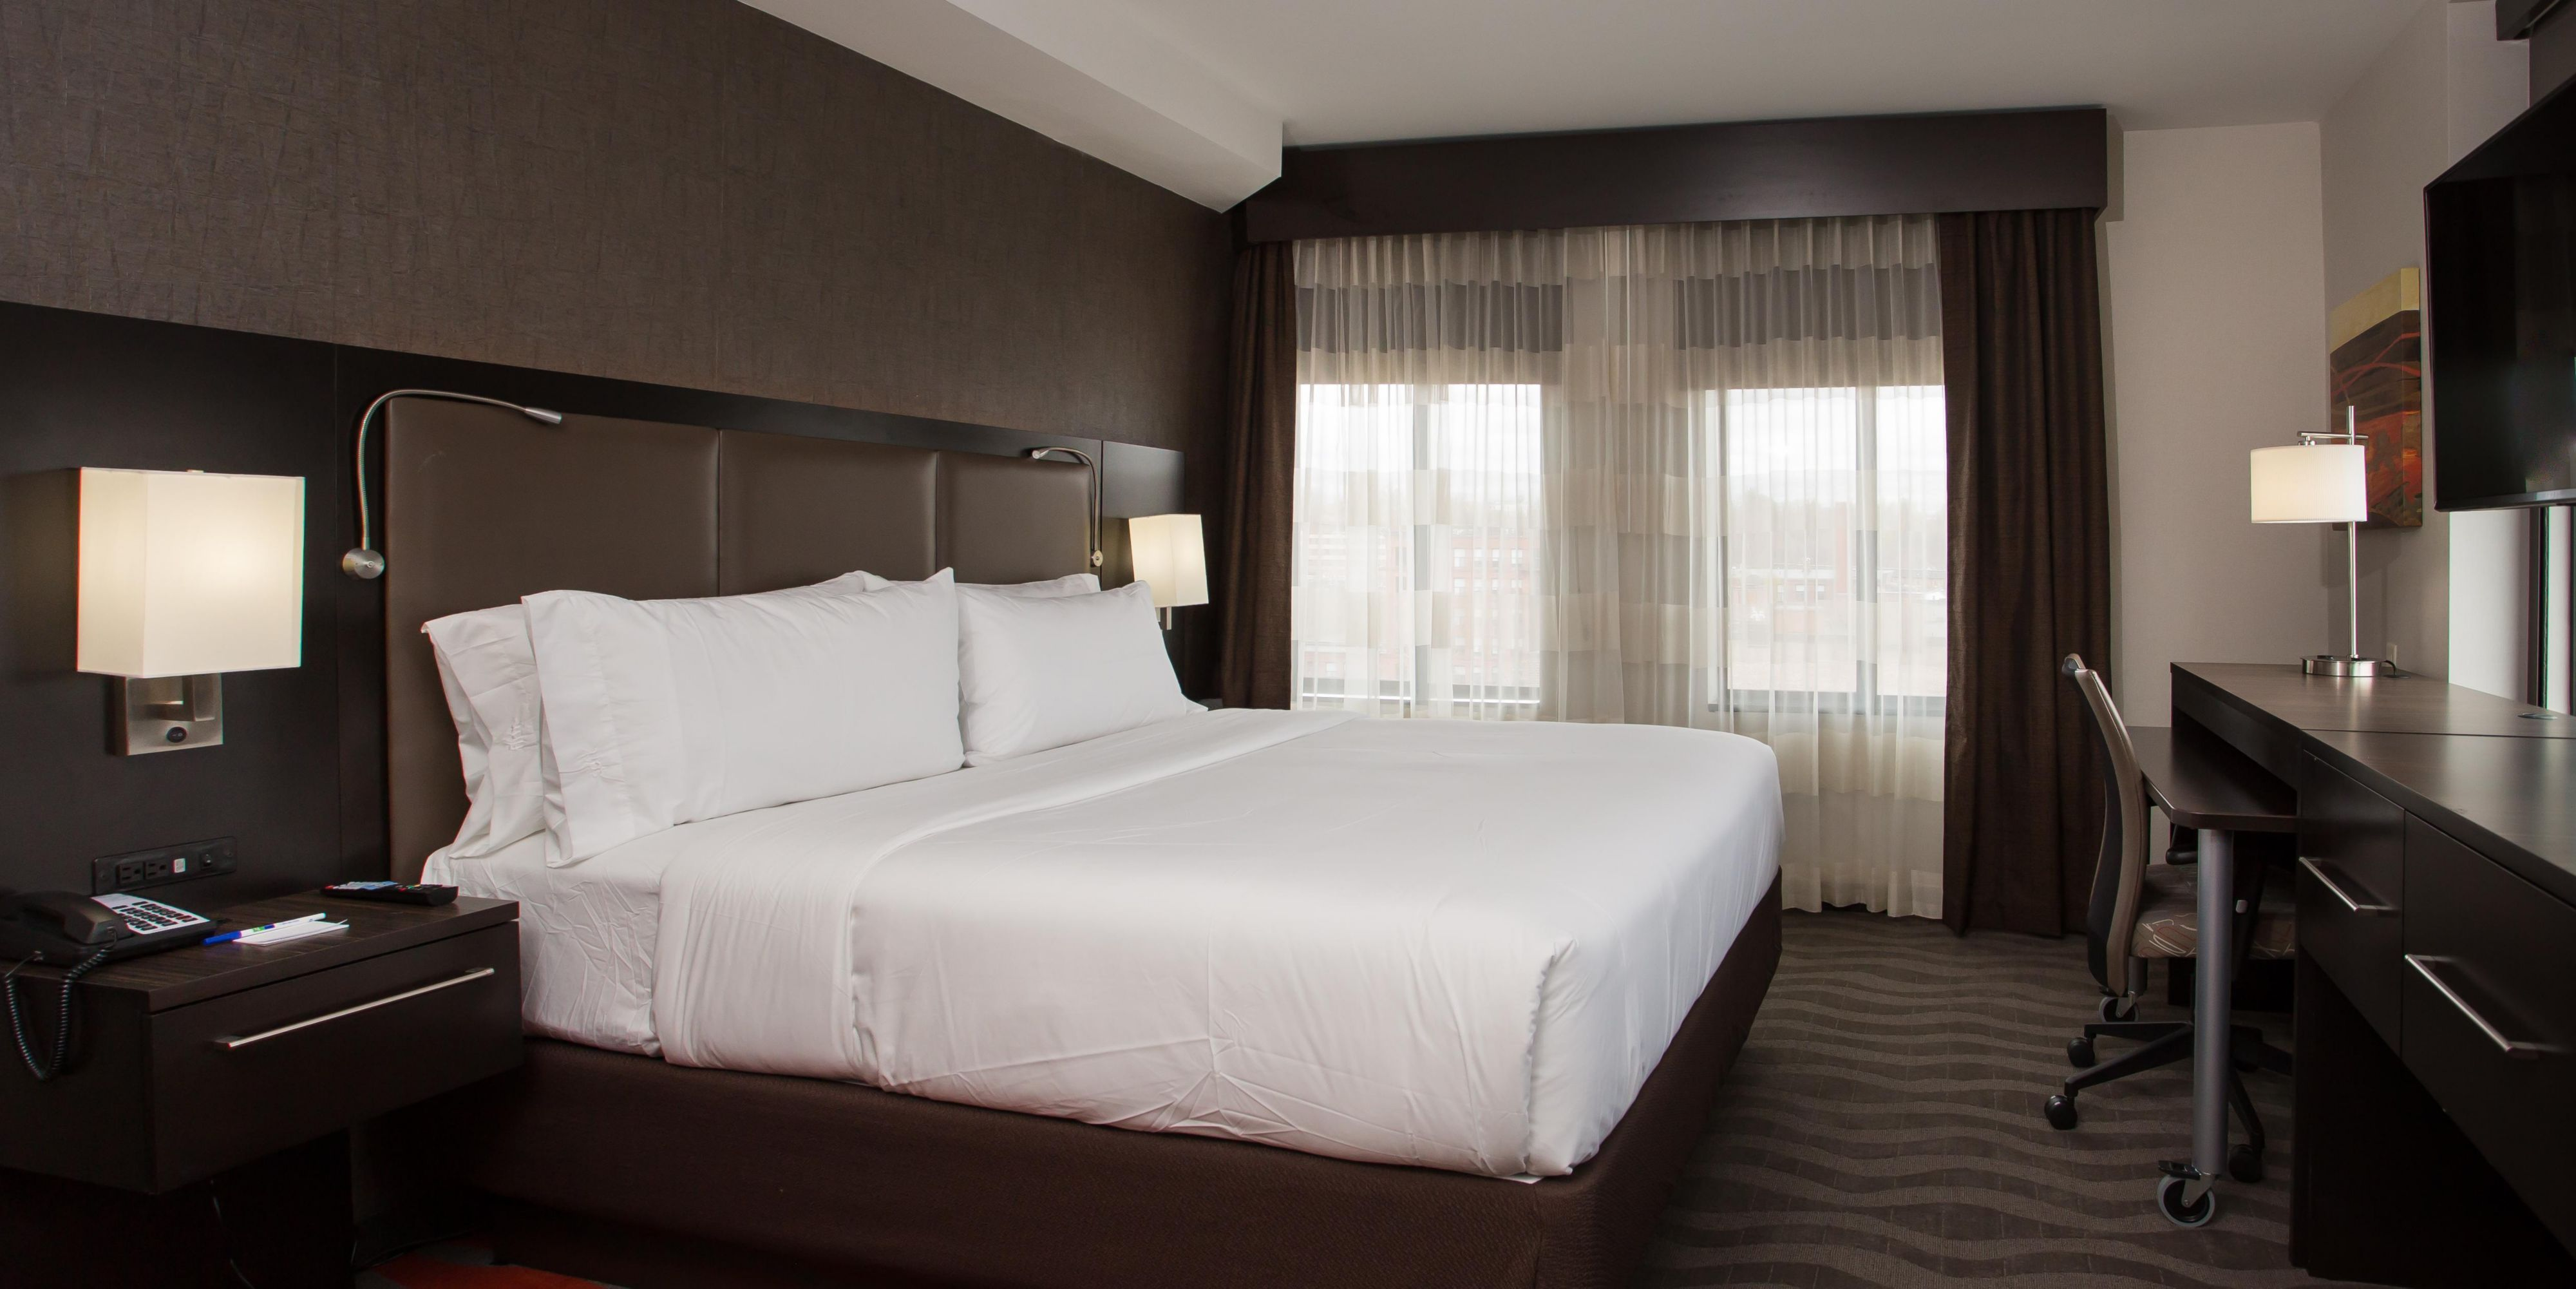 Holiday Inn Express Springfield 5500648611 2x1 Holiday Inn Inn Springfield